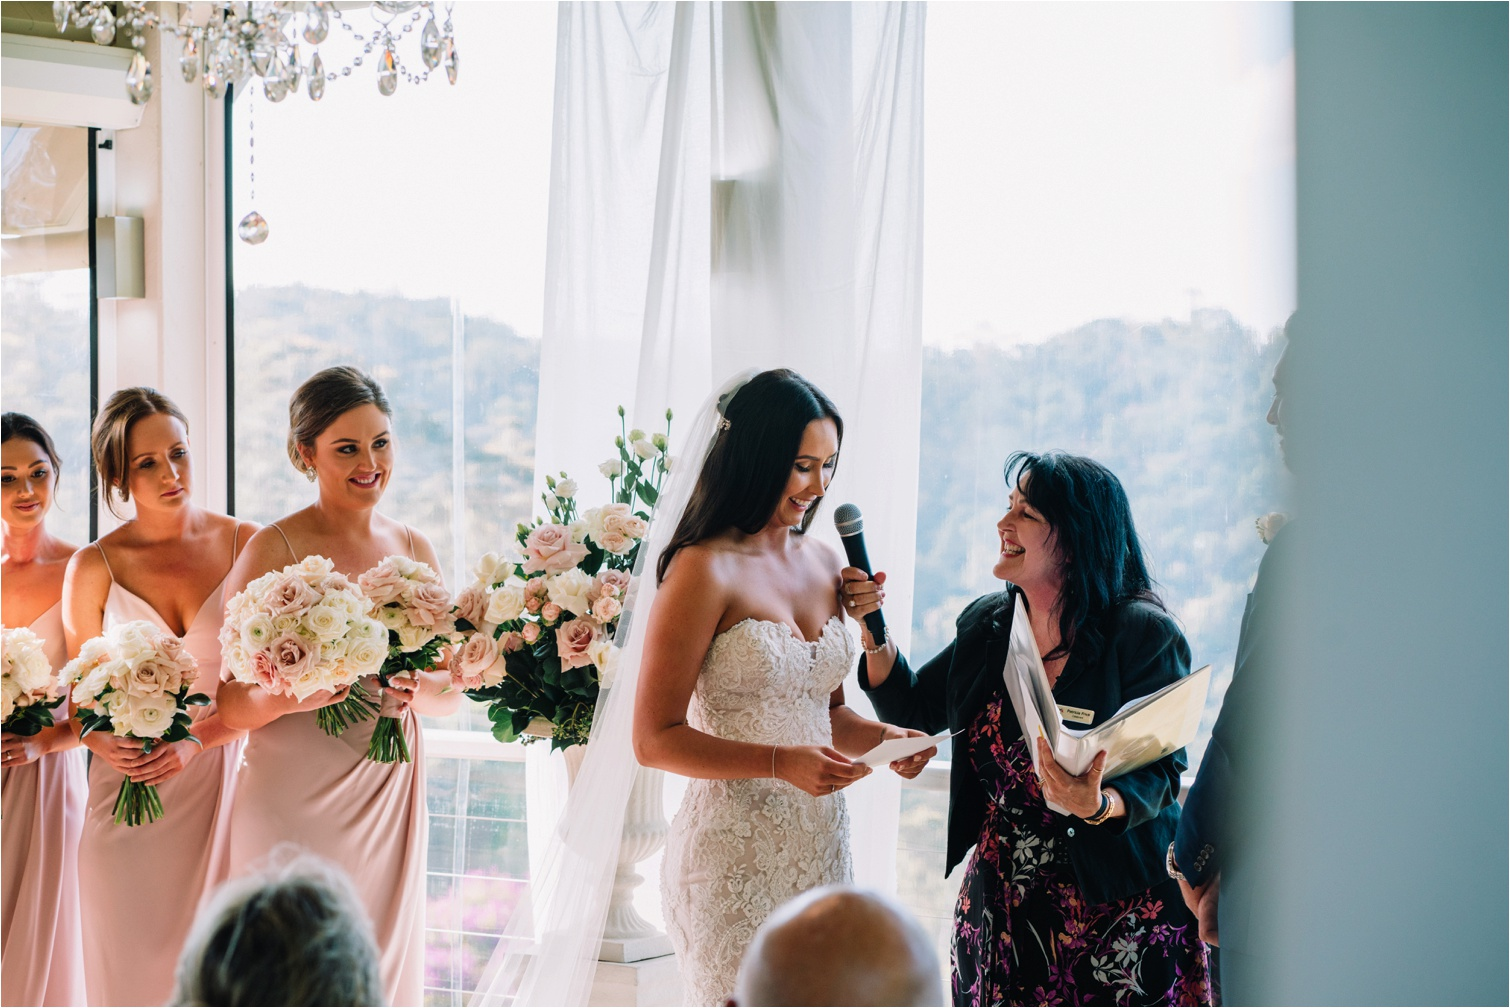 Maleny Manor Wedding Photography - Gold Coast Wedding Photographer_0025.jpg